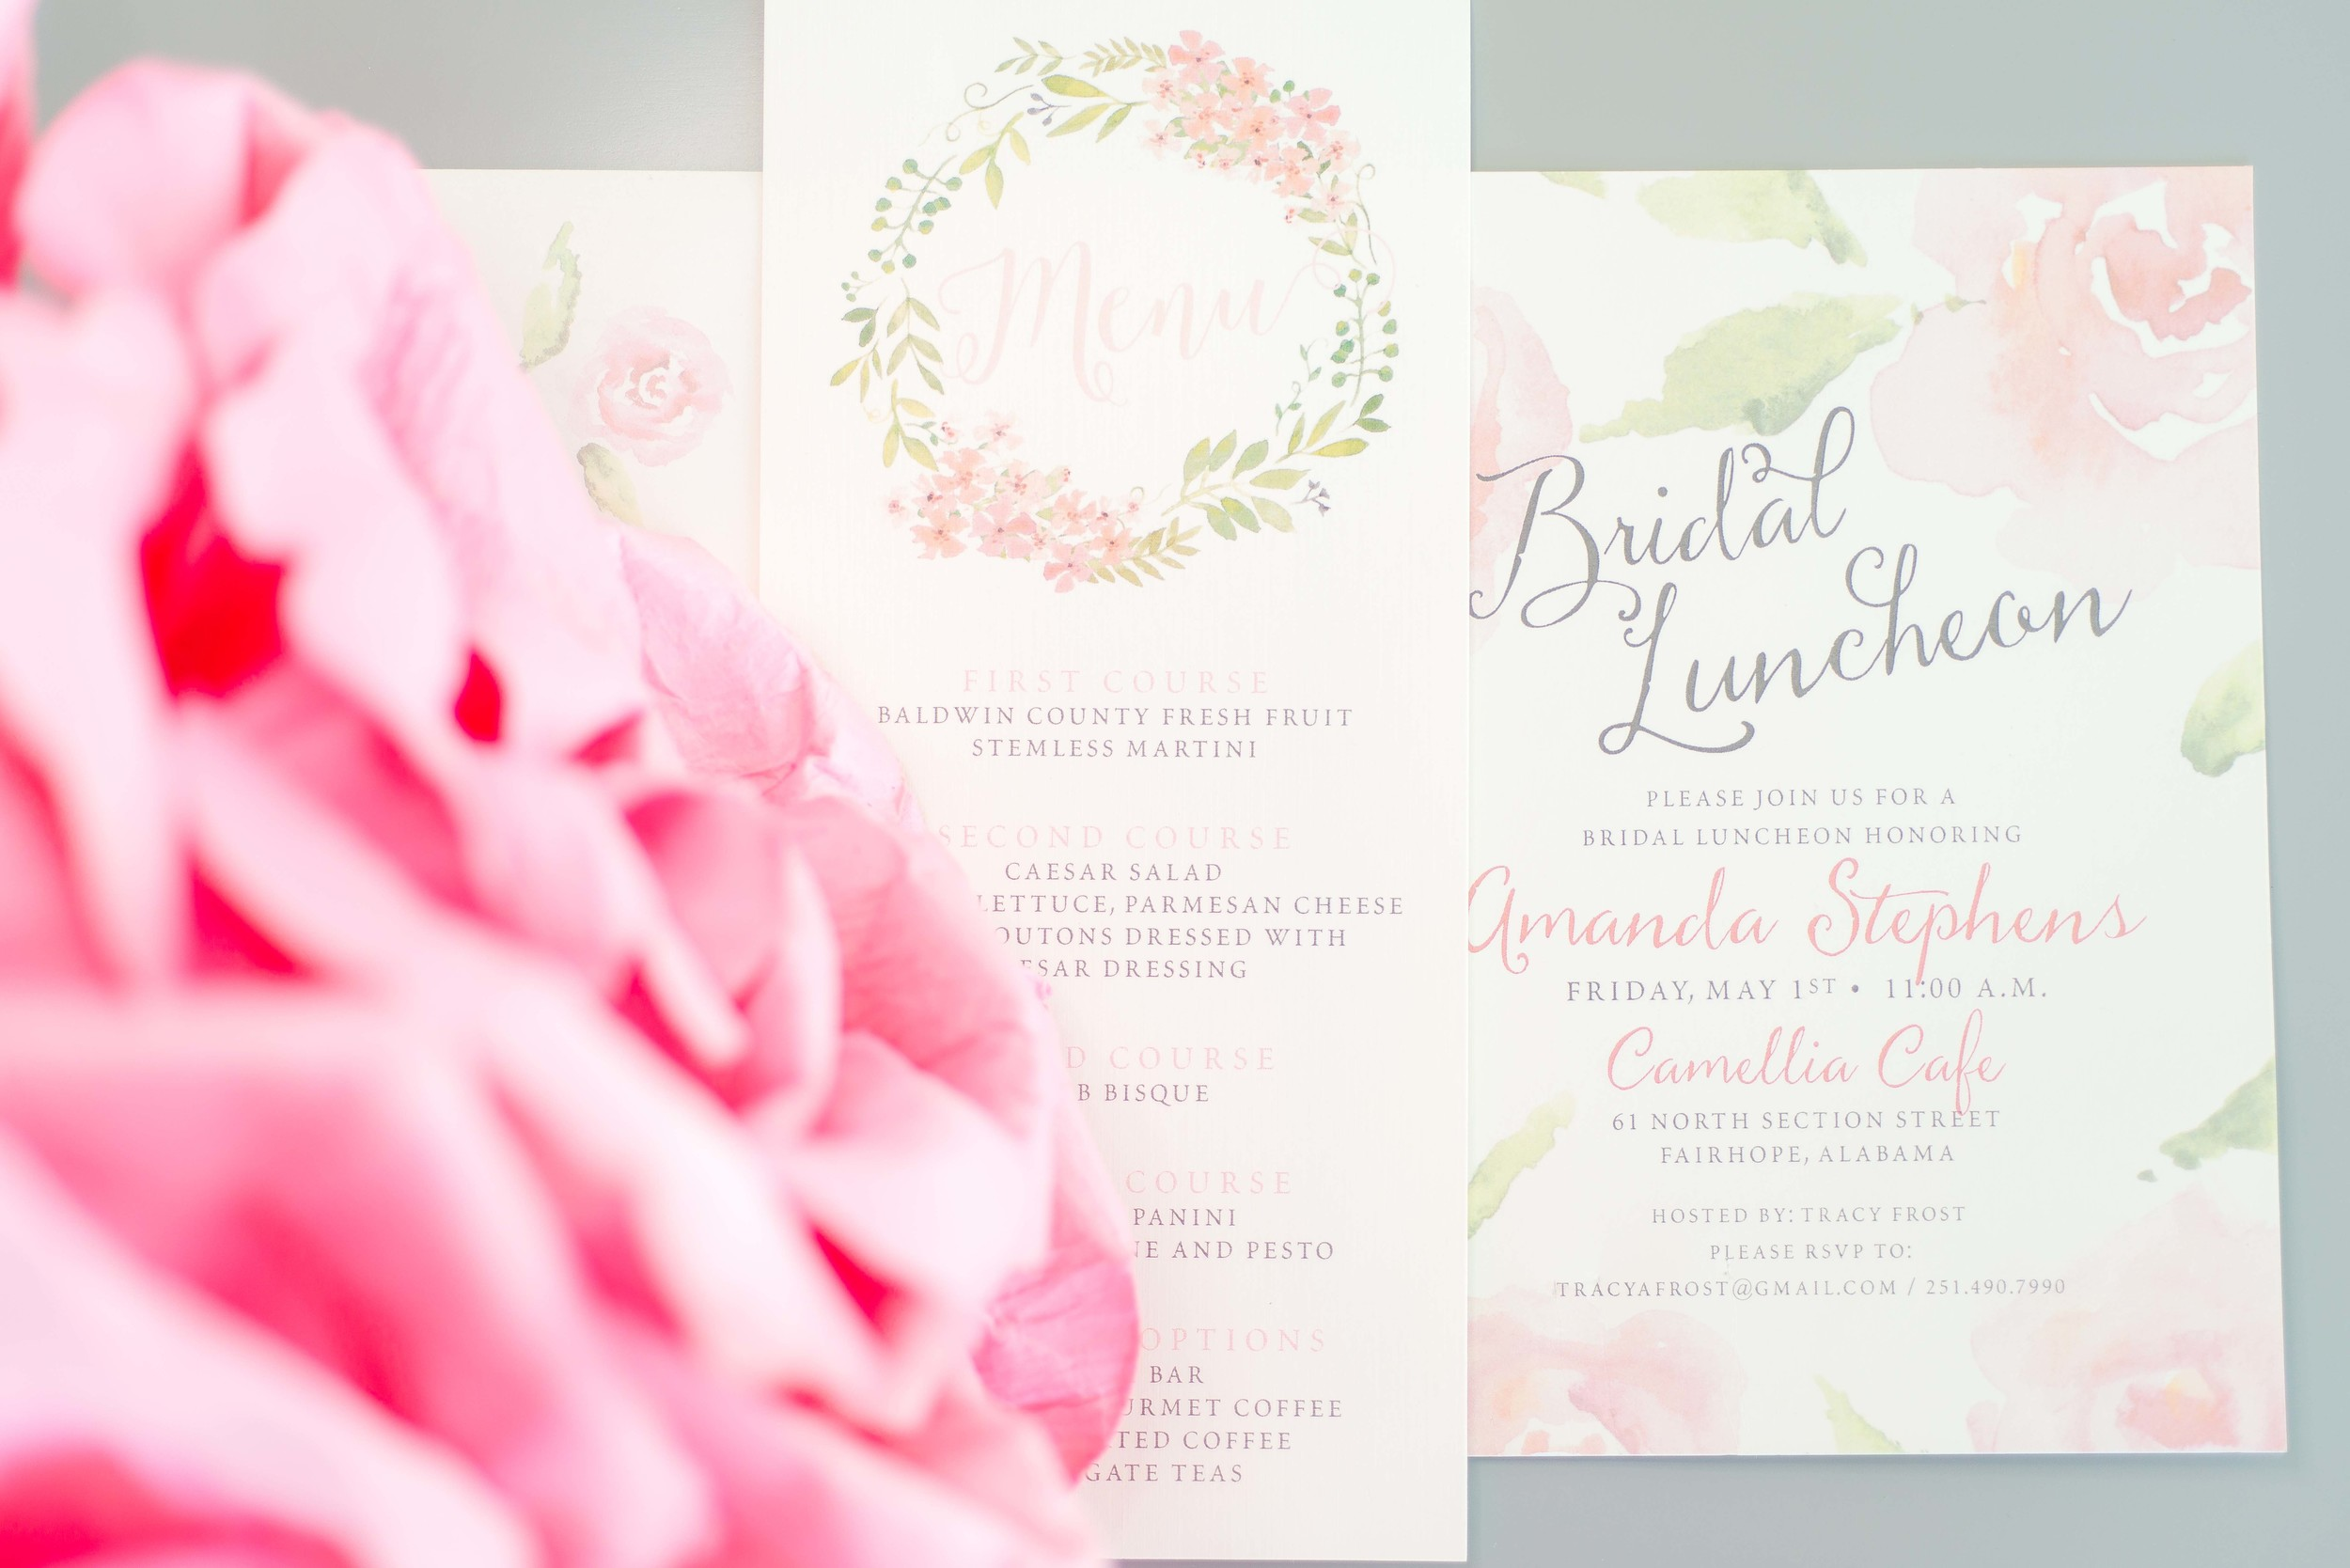 Bridesmaids Luncheon Invitation & Coordinating Menu